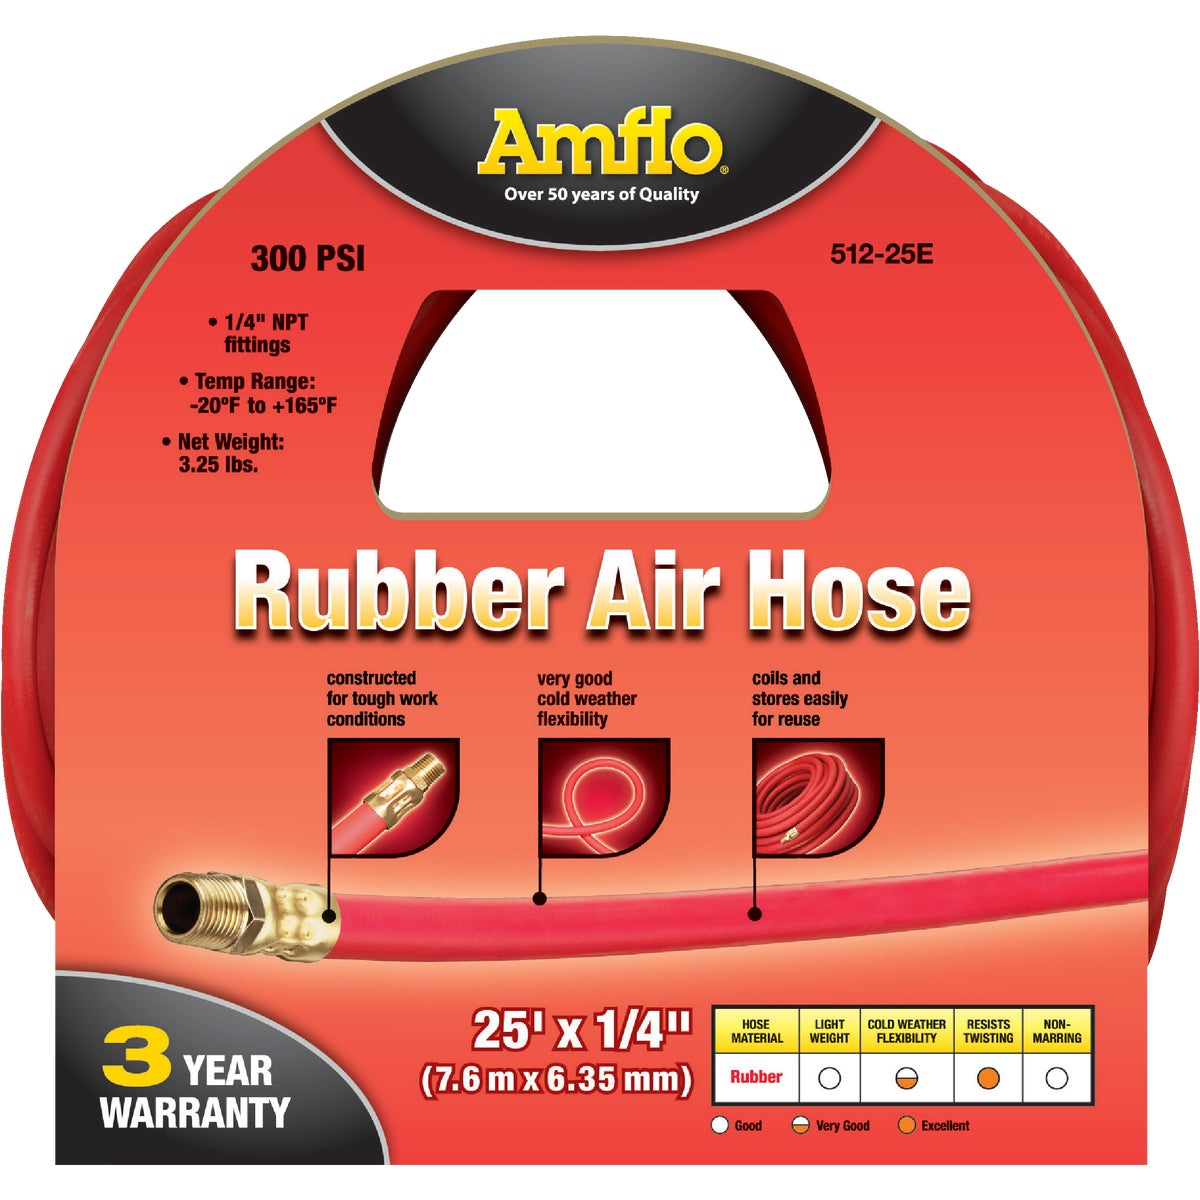 Plews/Lubrimatic 1/4X25' RUBBER AIR HOSE 512-25E